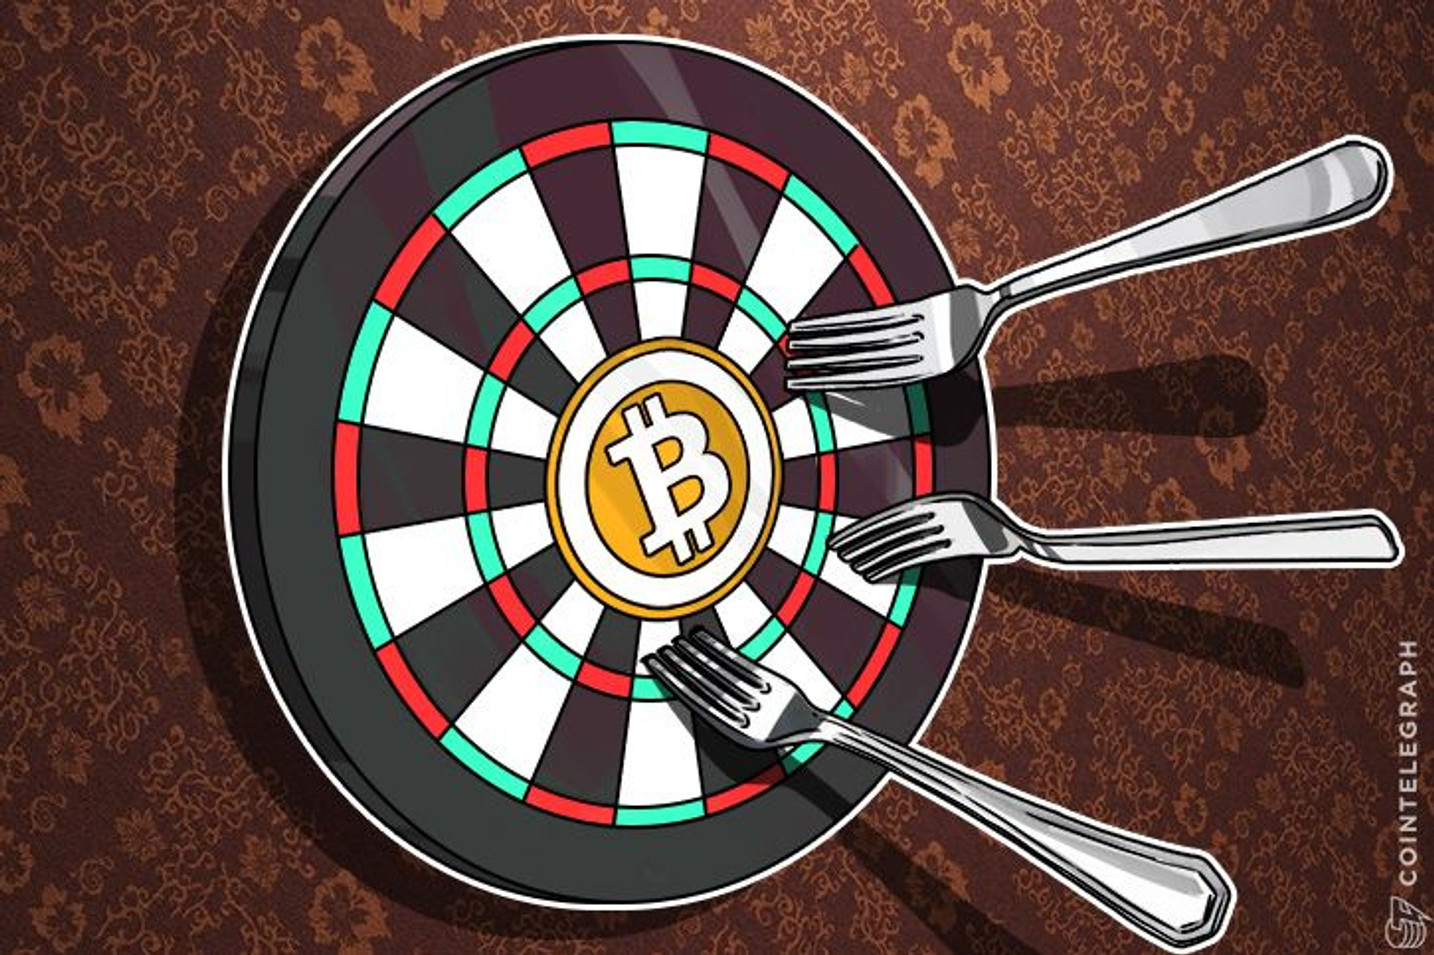 Bitcoin Provavelmente Perderá Valor Com Hard Ou Soft Fork: Wealth Daily